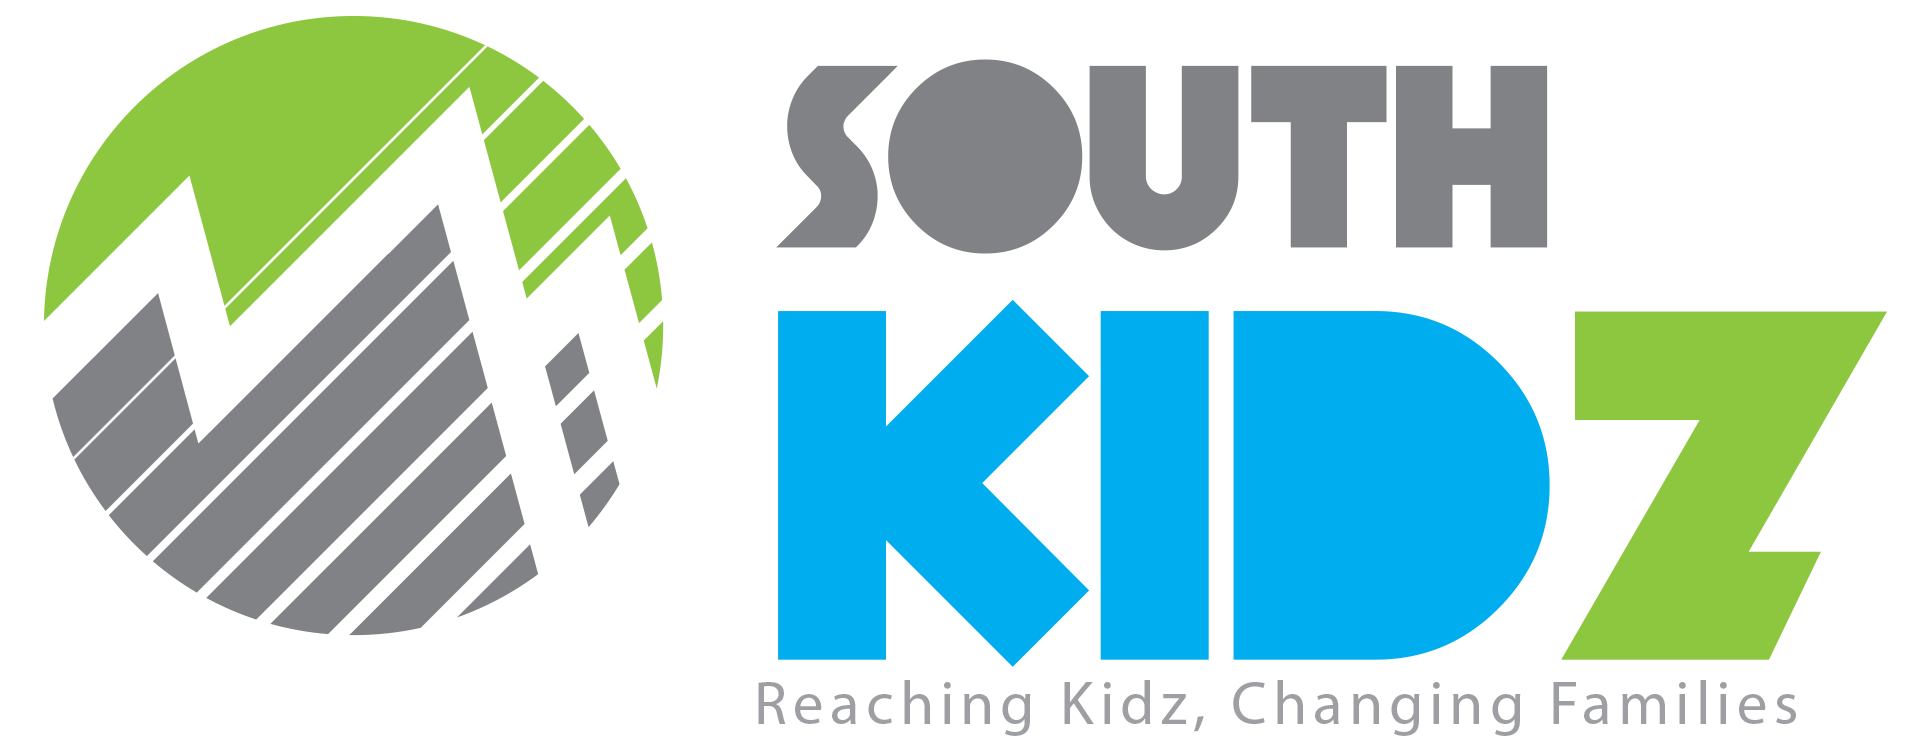 South Kidz reaching Logo 2.png